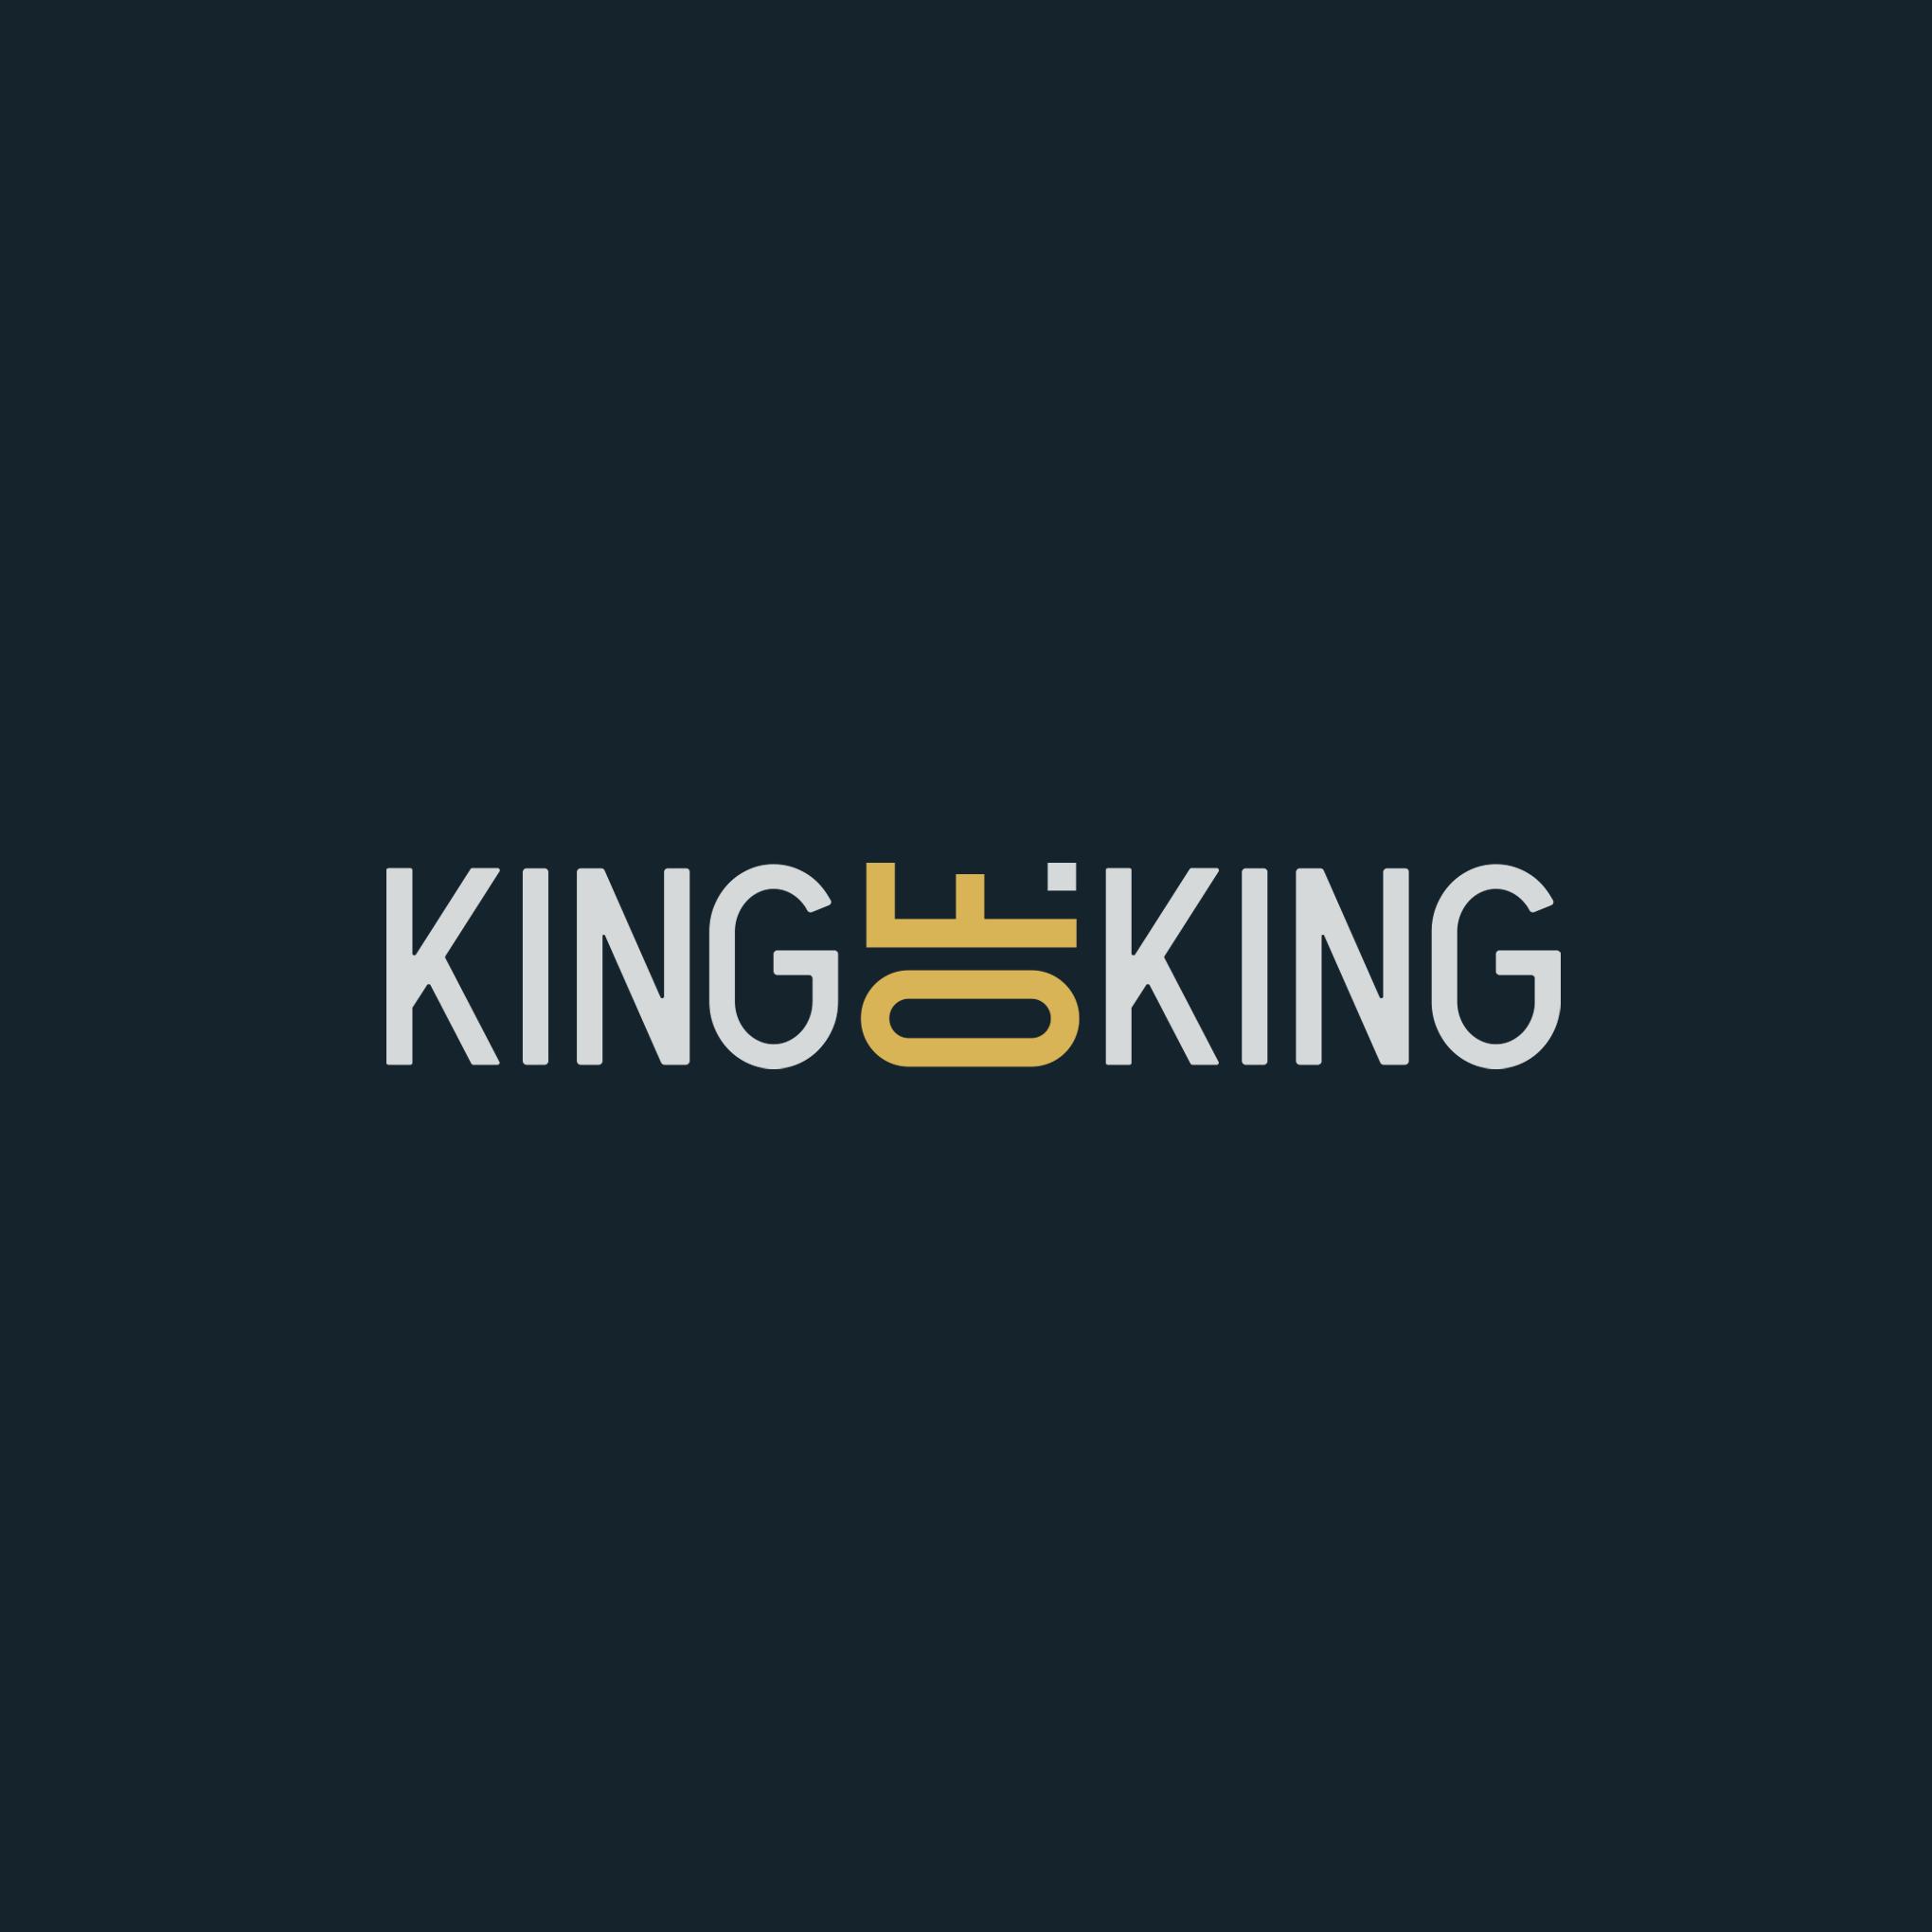 King Of King Photography Logo Photography Logos Logo Design Company Logo